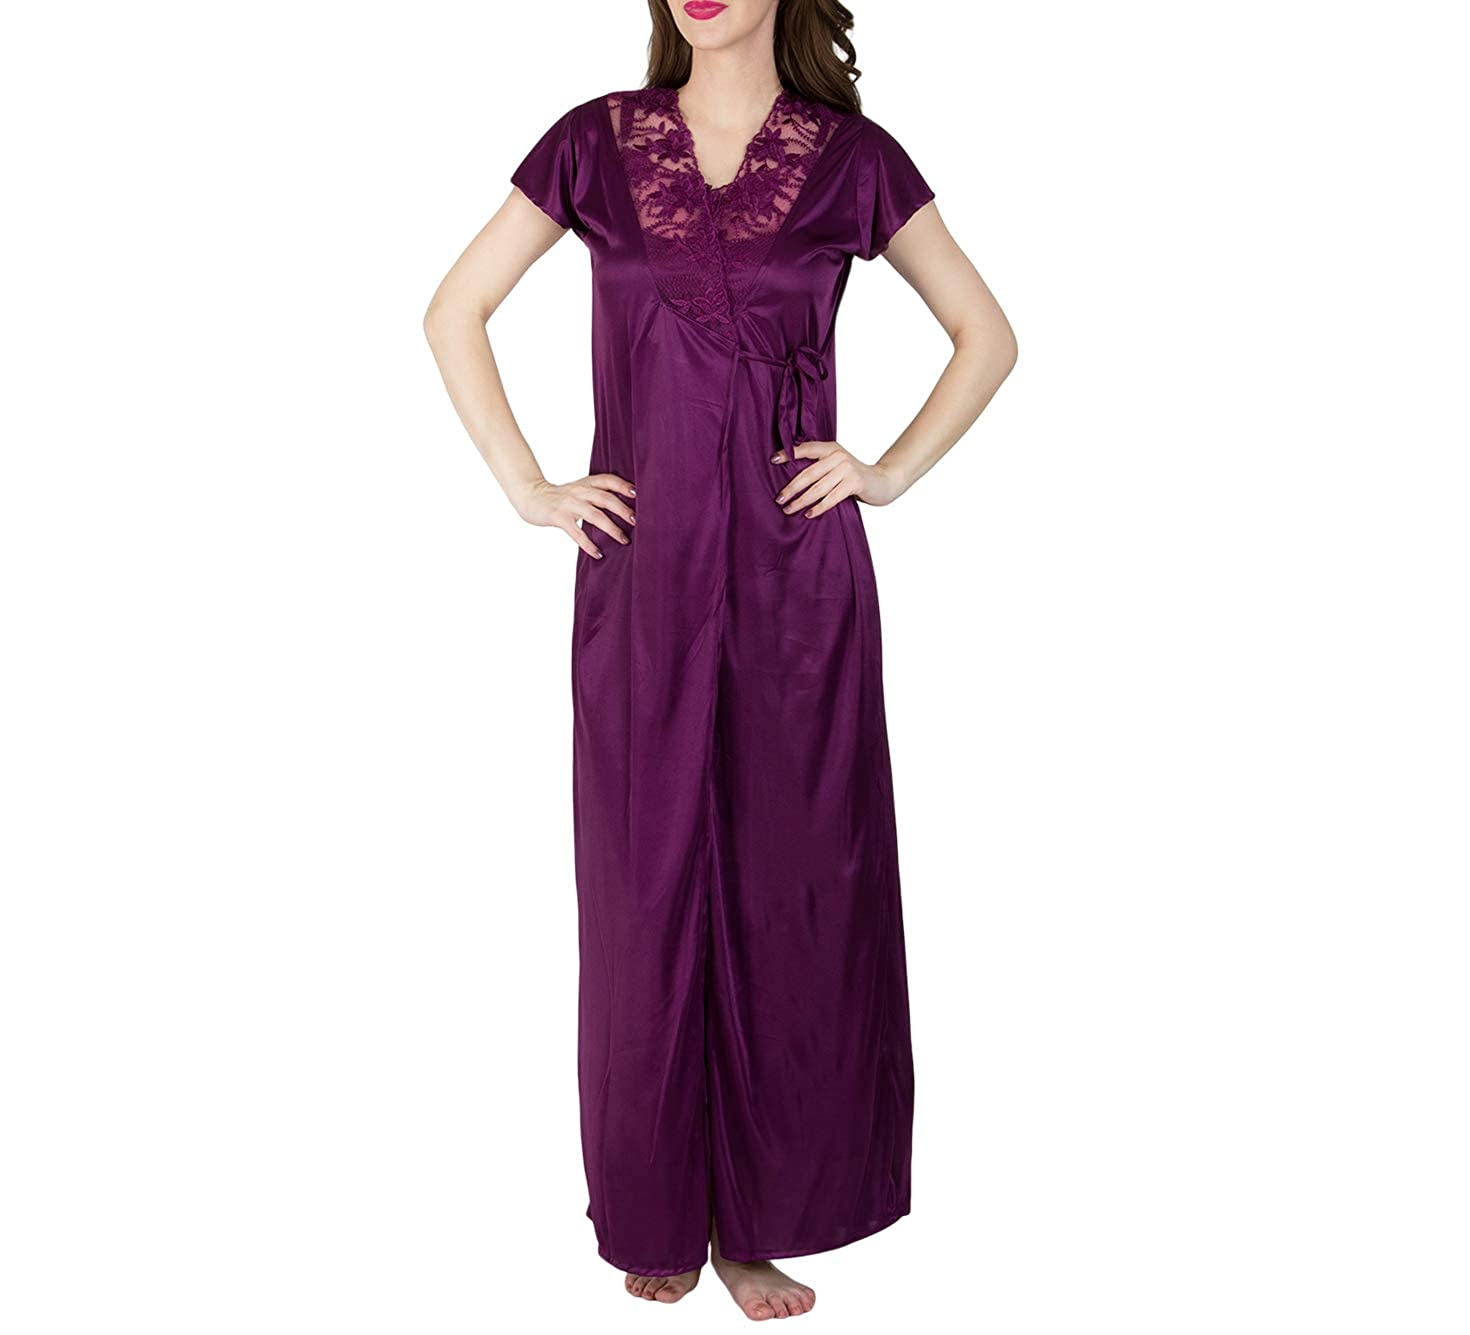 cfb802a4b5 BOMBSHELL Women s Satin Nightwear Night Dress Nighty Set of 4 Pcs Nighty